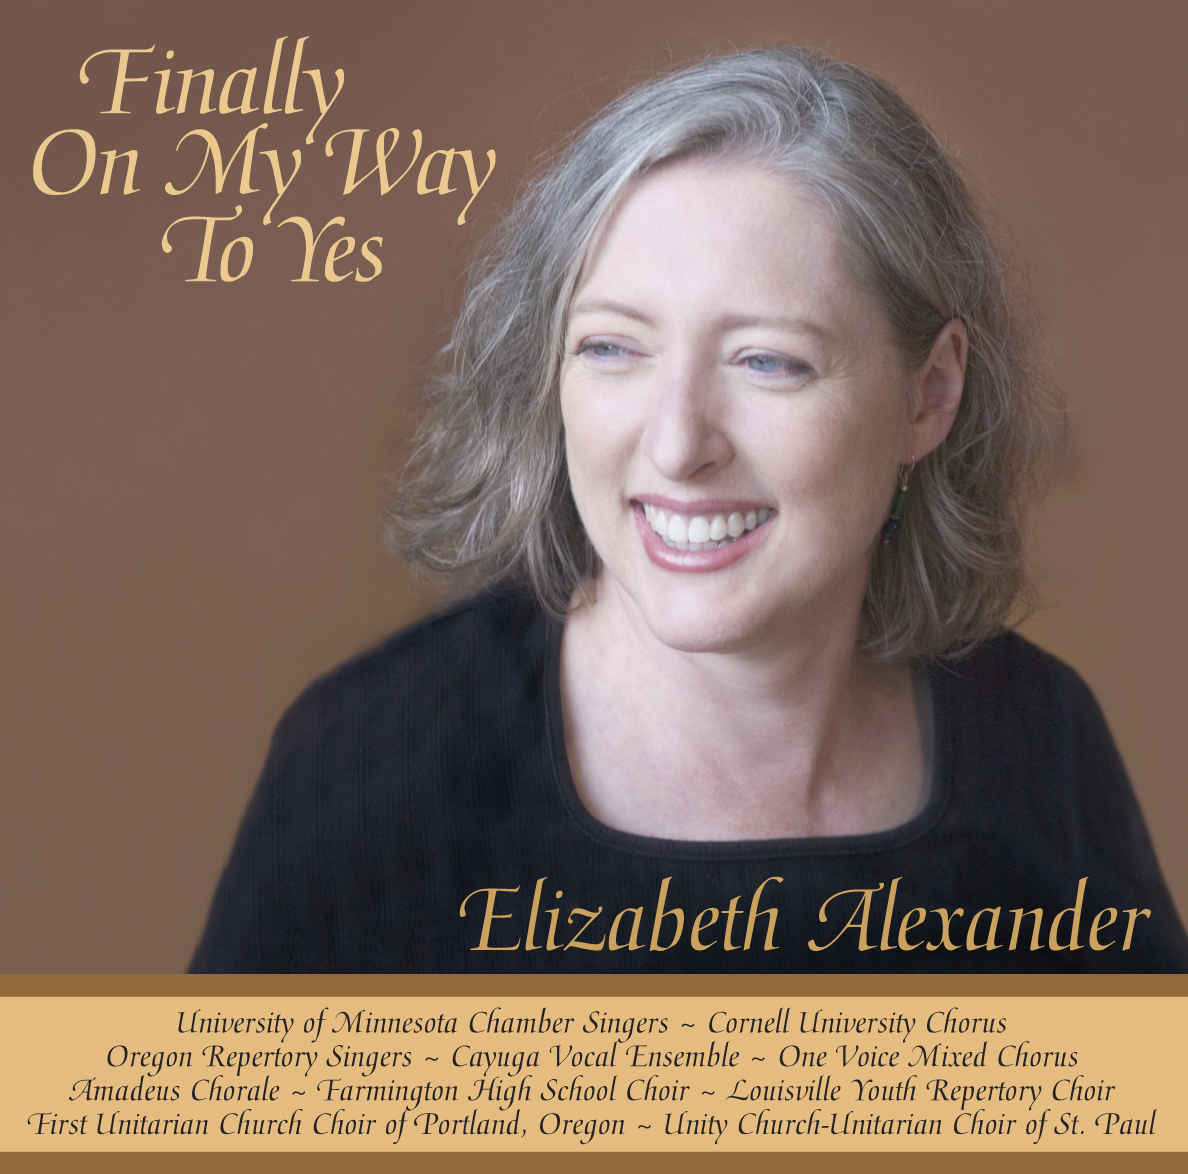 SEA-CD-01 - Finally On My Way To Yes (CD/mp3)